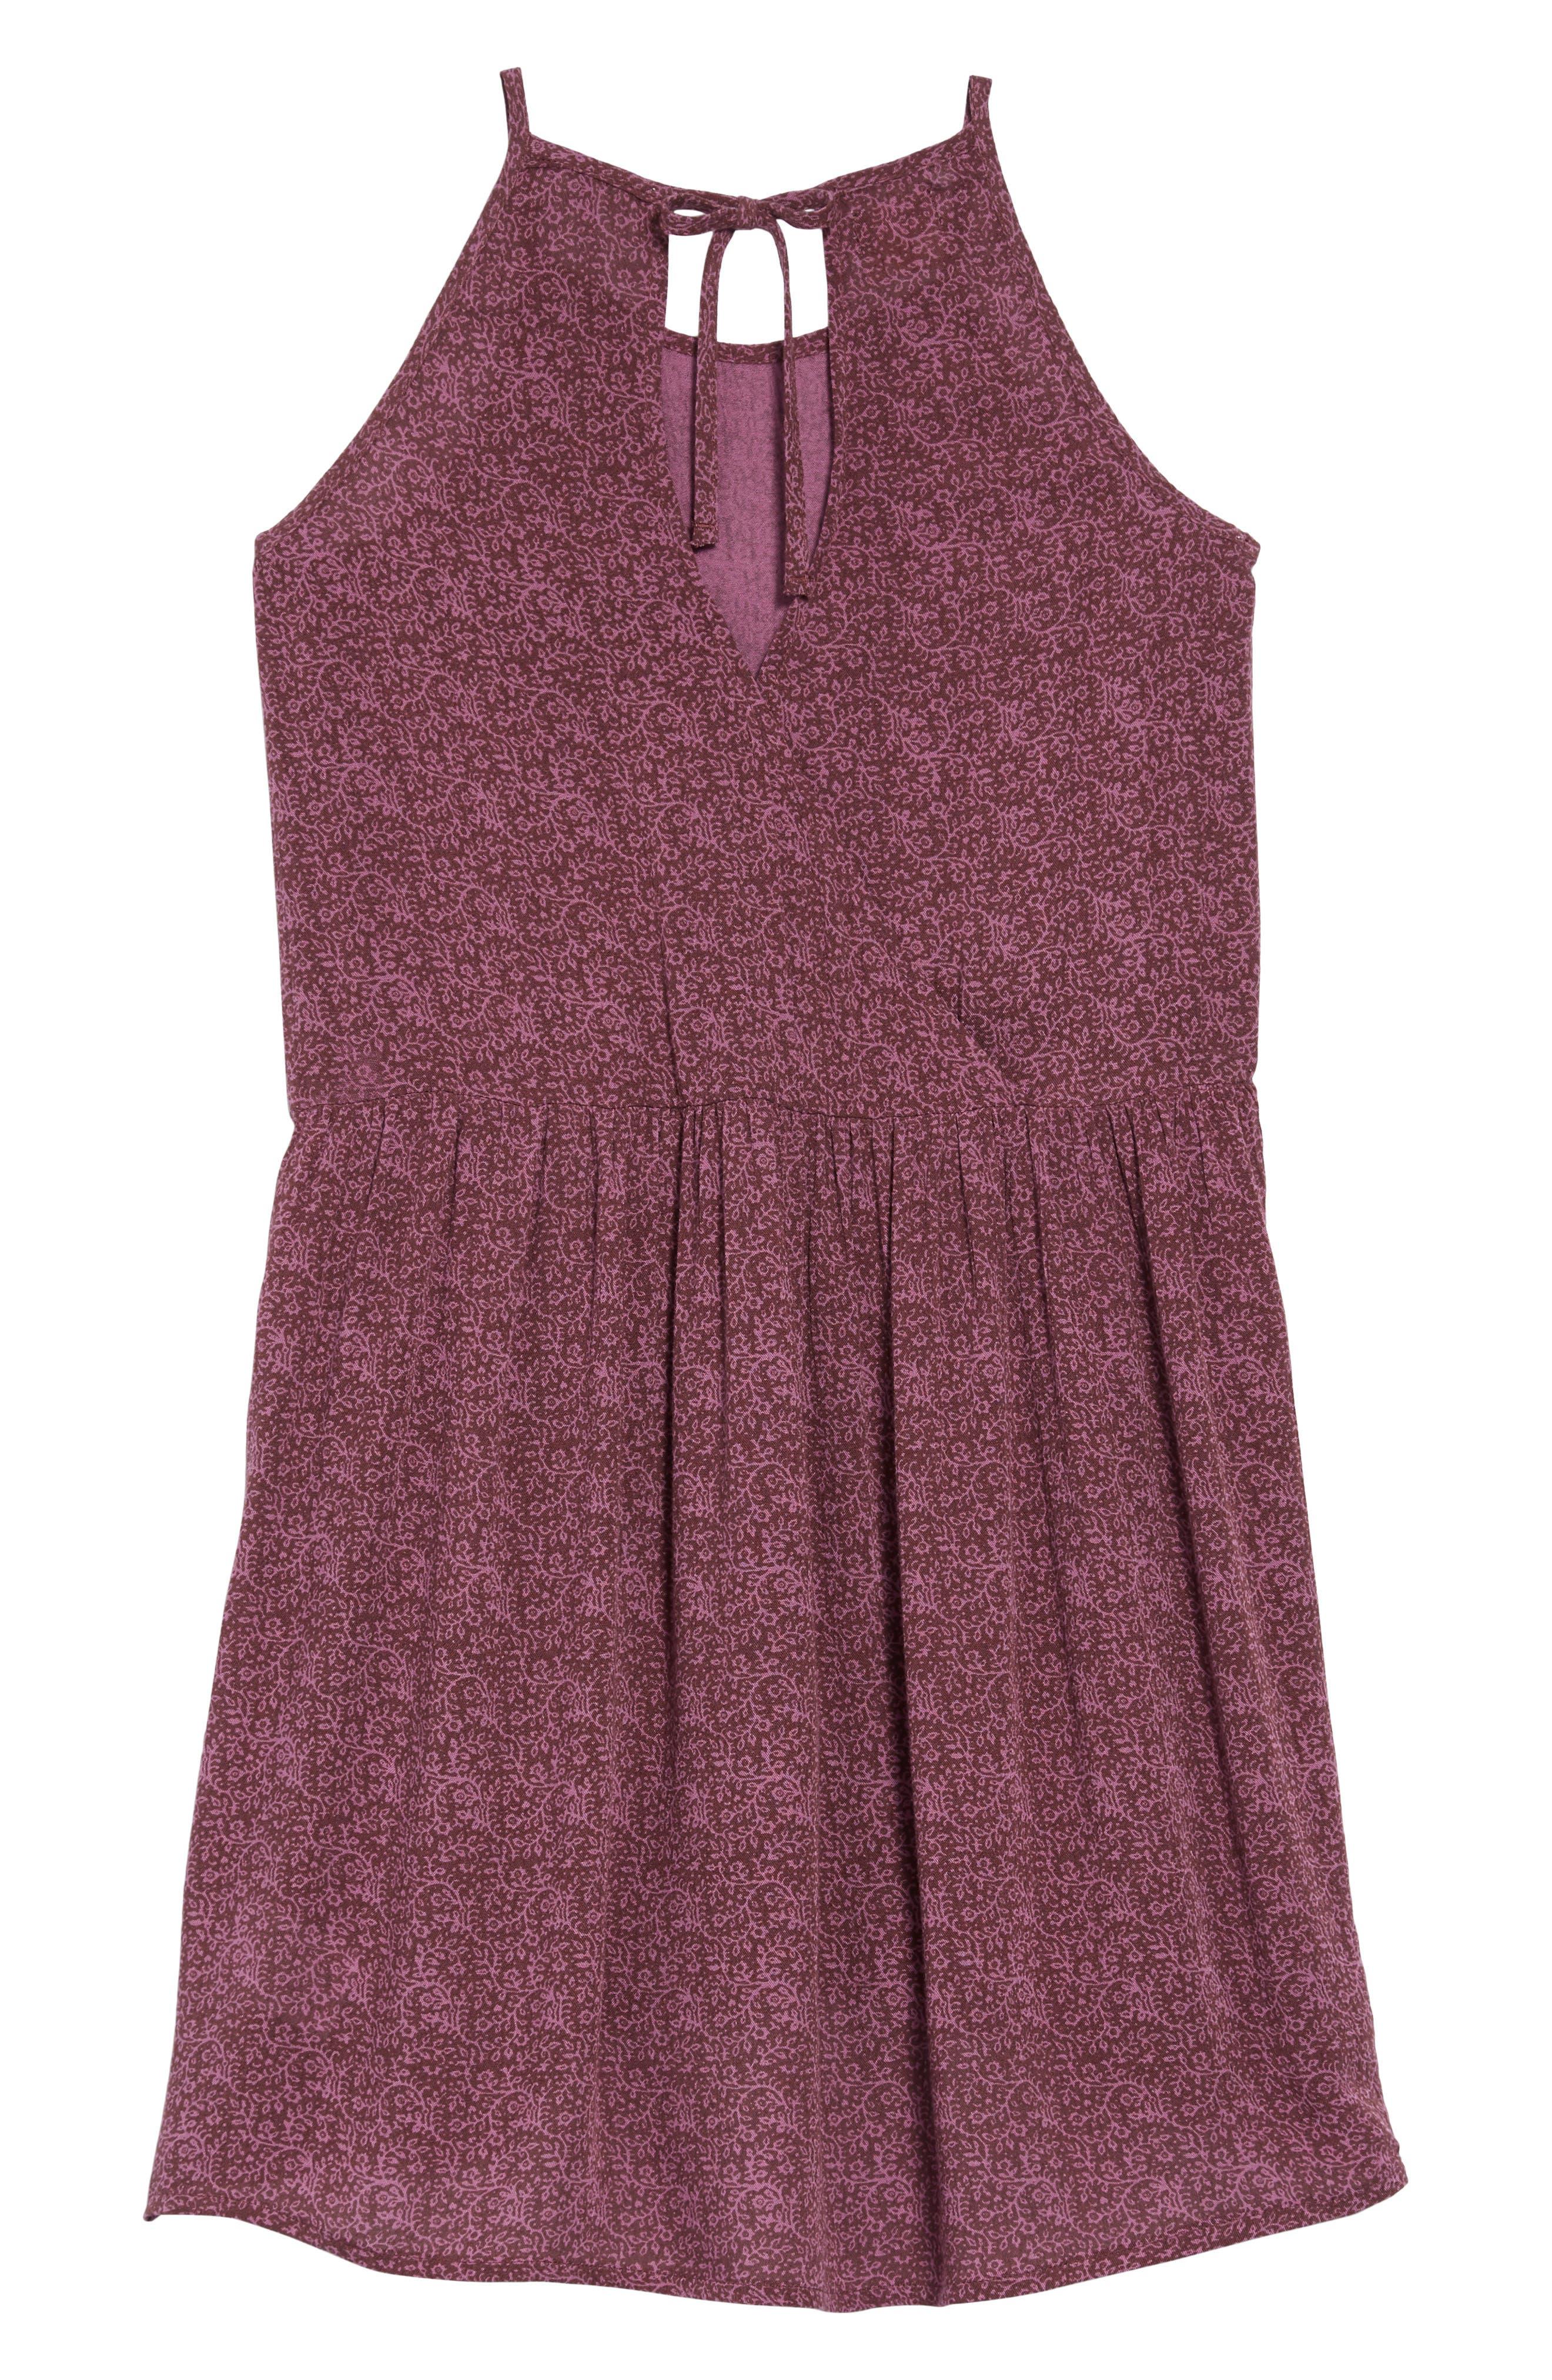 Shadowplay Halter Dress,                             Alternate thumbnail 2, color,                             200